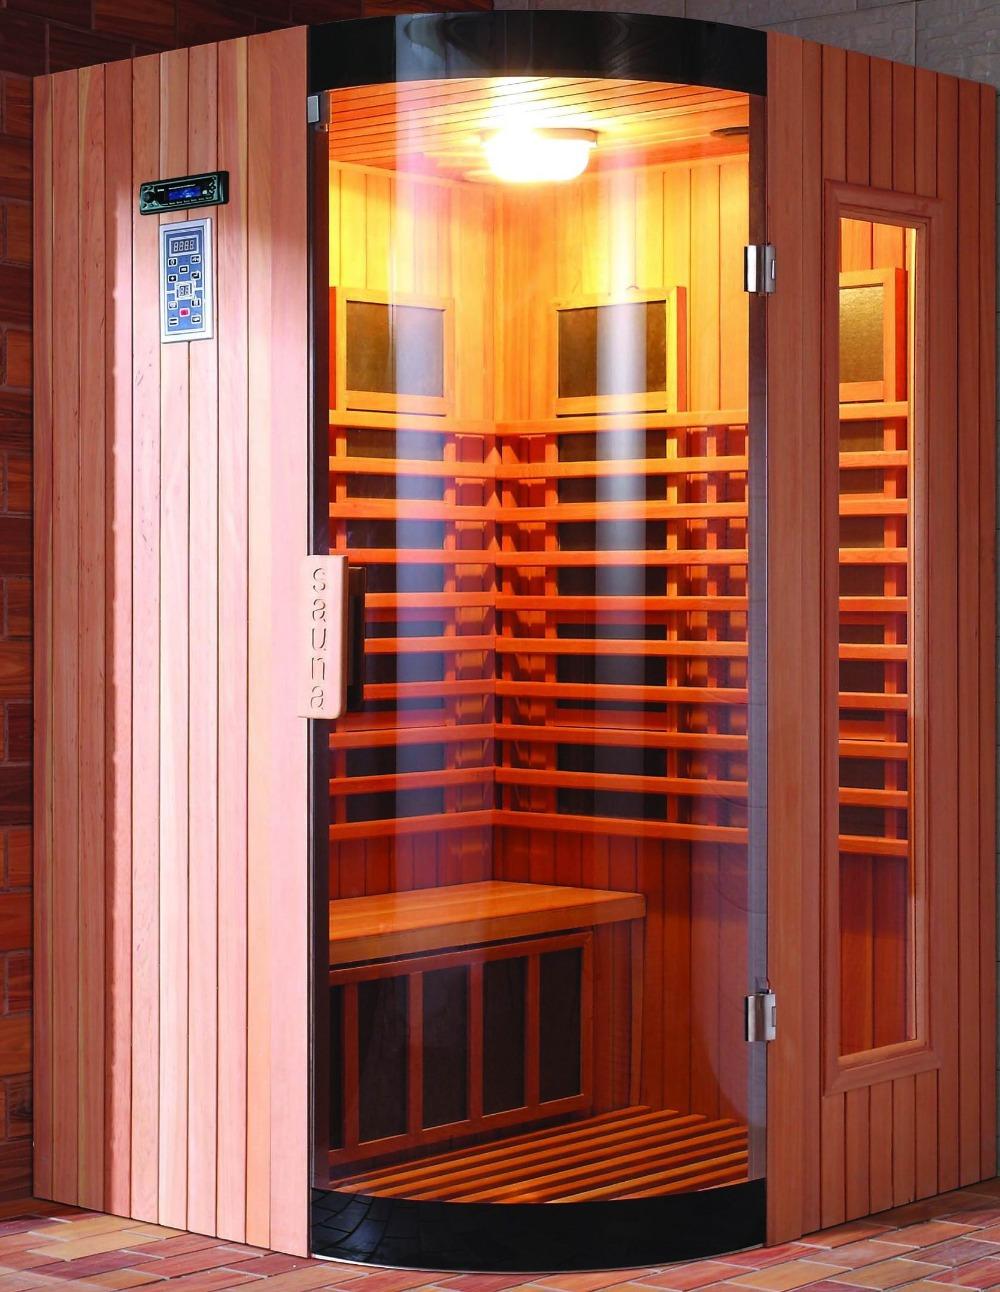 Infrared Sauna With Salt Wall In Nh Hotel Zandvoort The: Infrared Saunas With Burma Hemlock Or Canadian Red Cedar